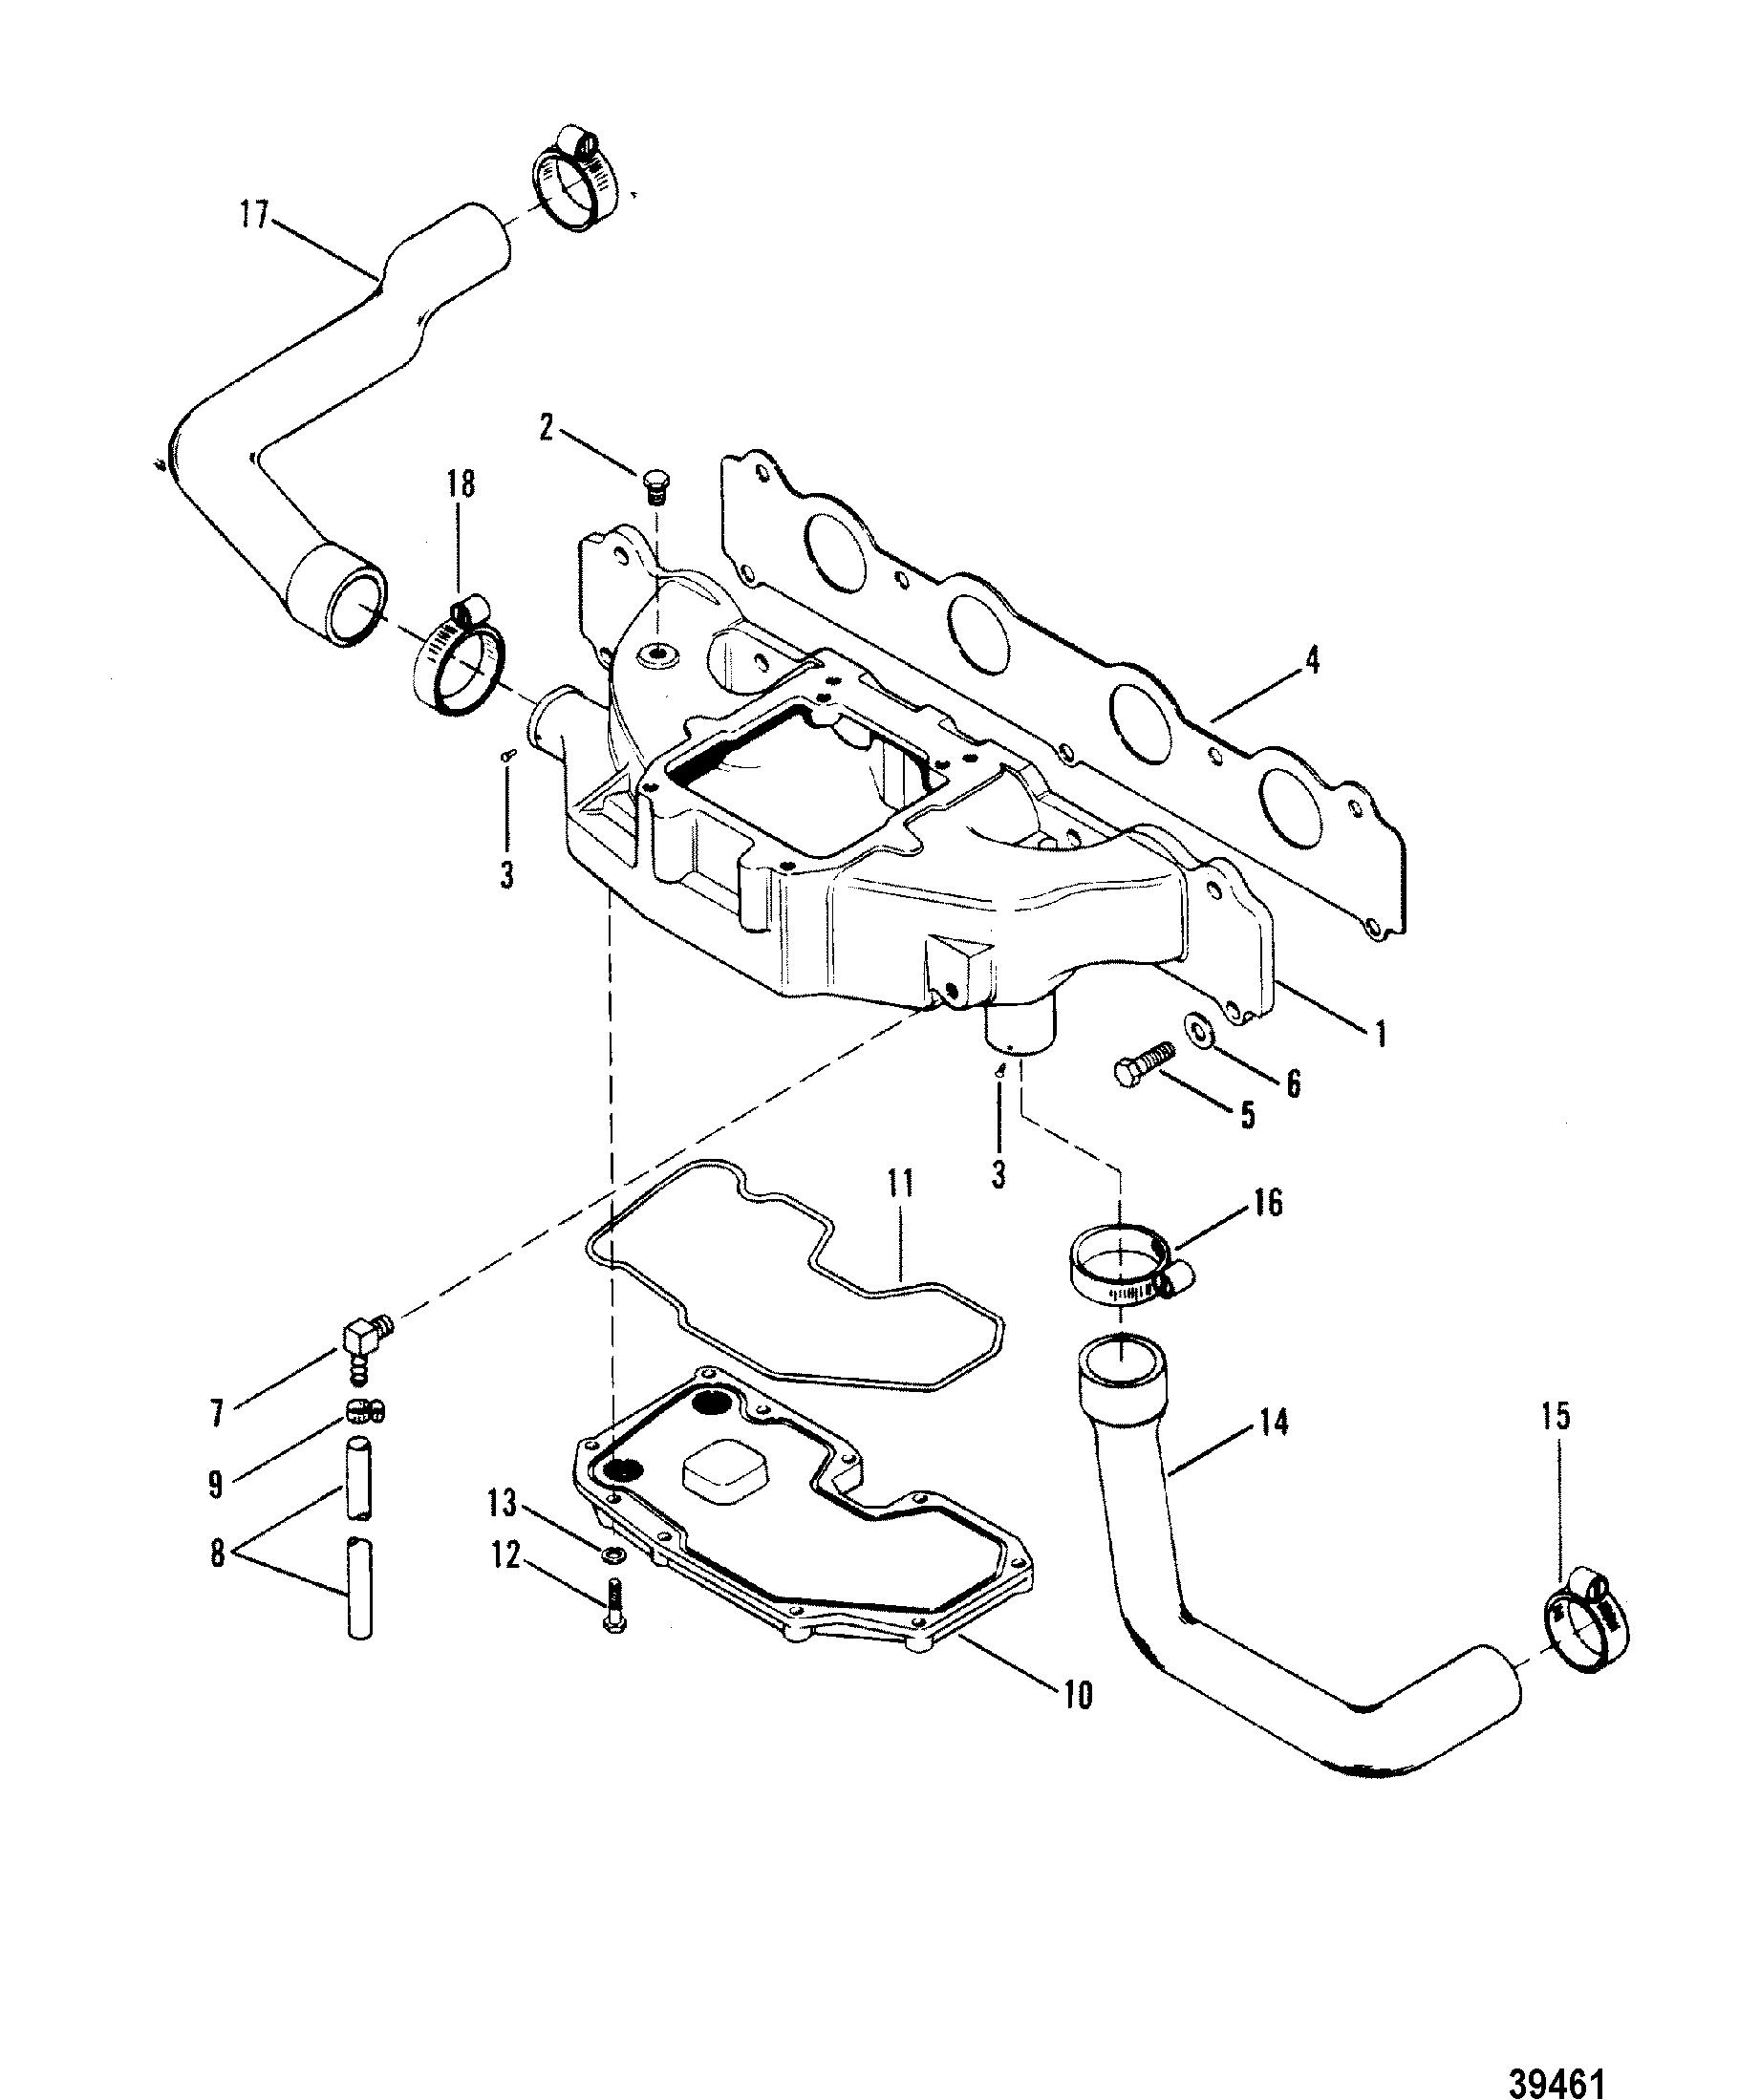 1986 mercruiser 4 3 engine wiring